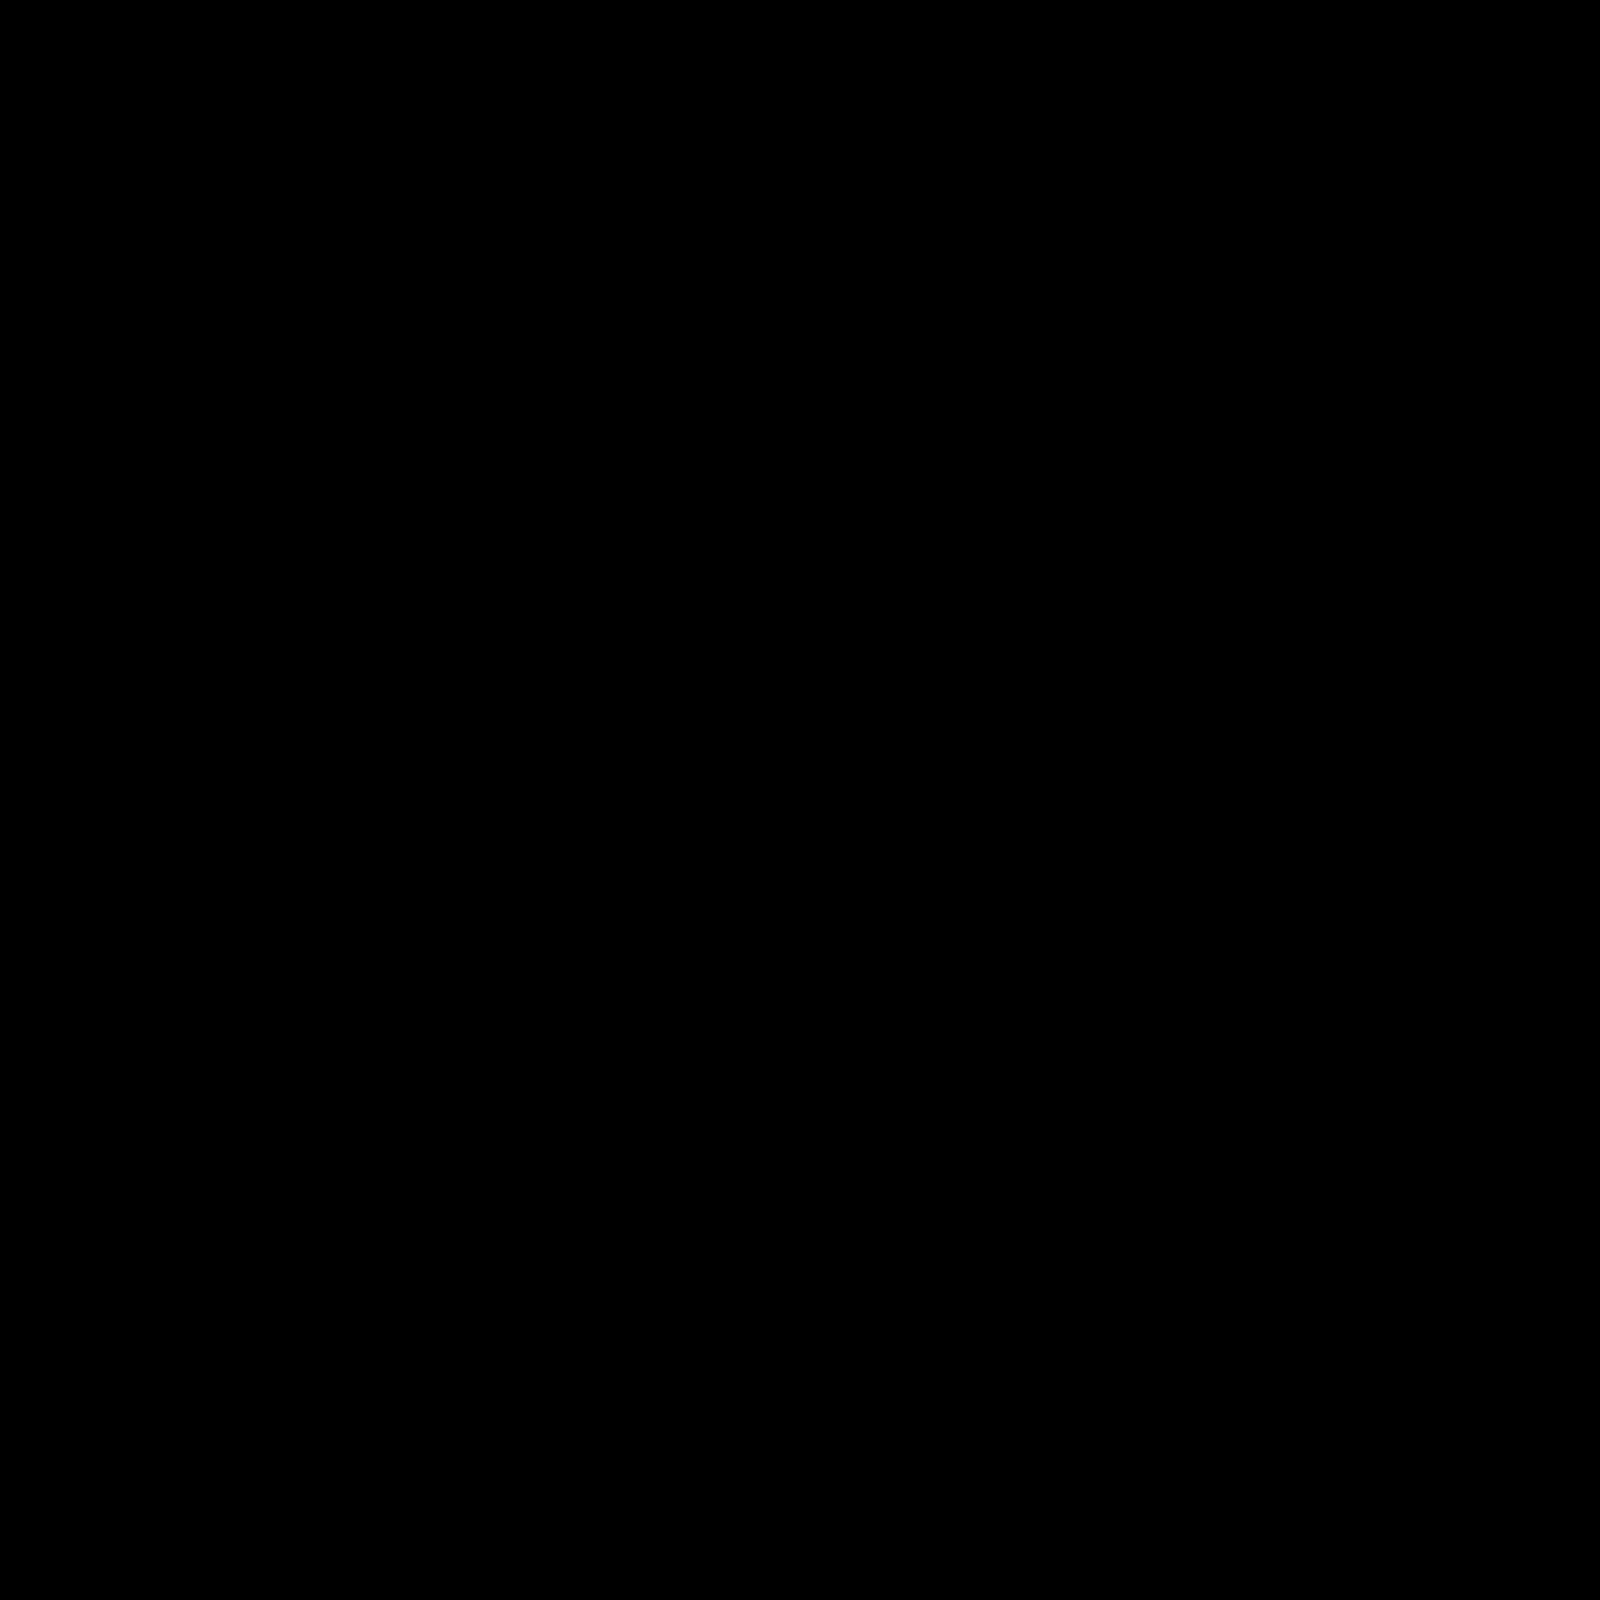 Latarnia z dyni icon